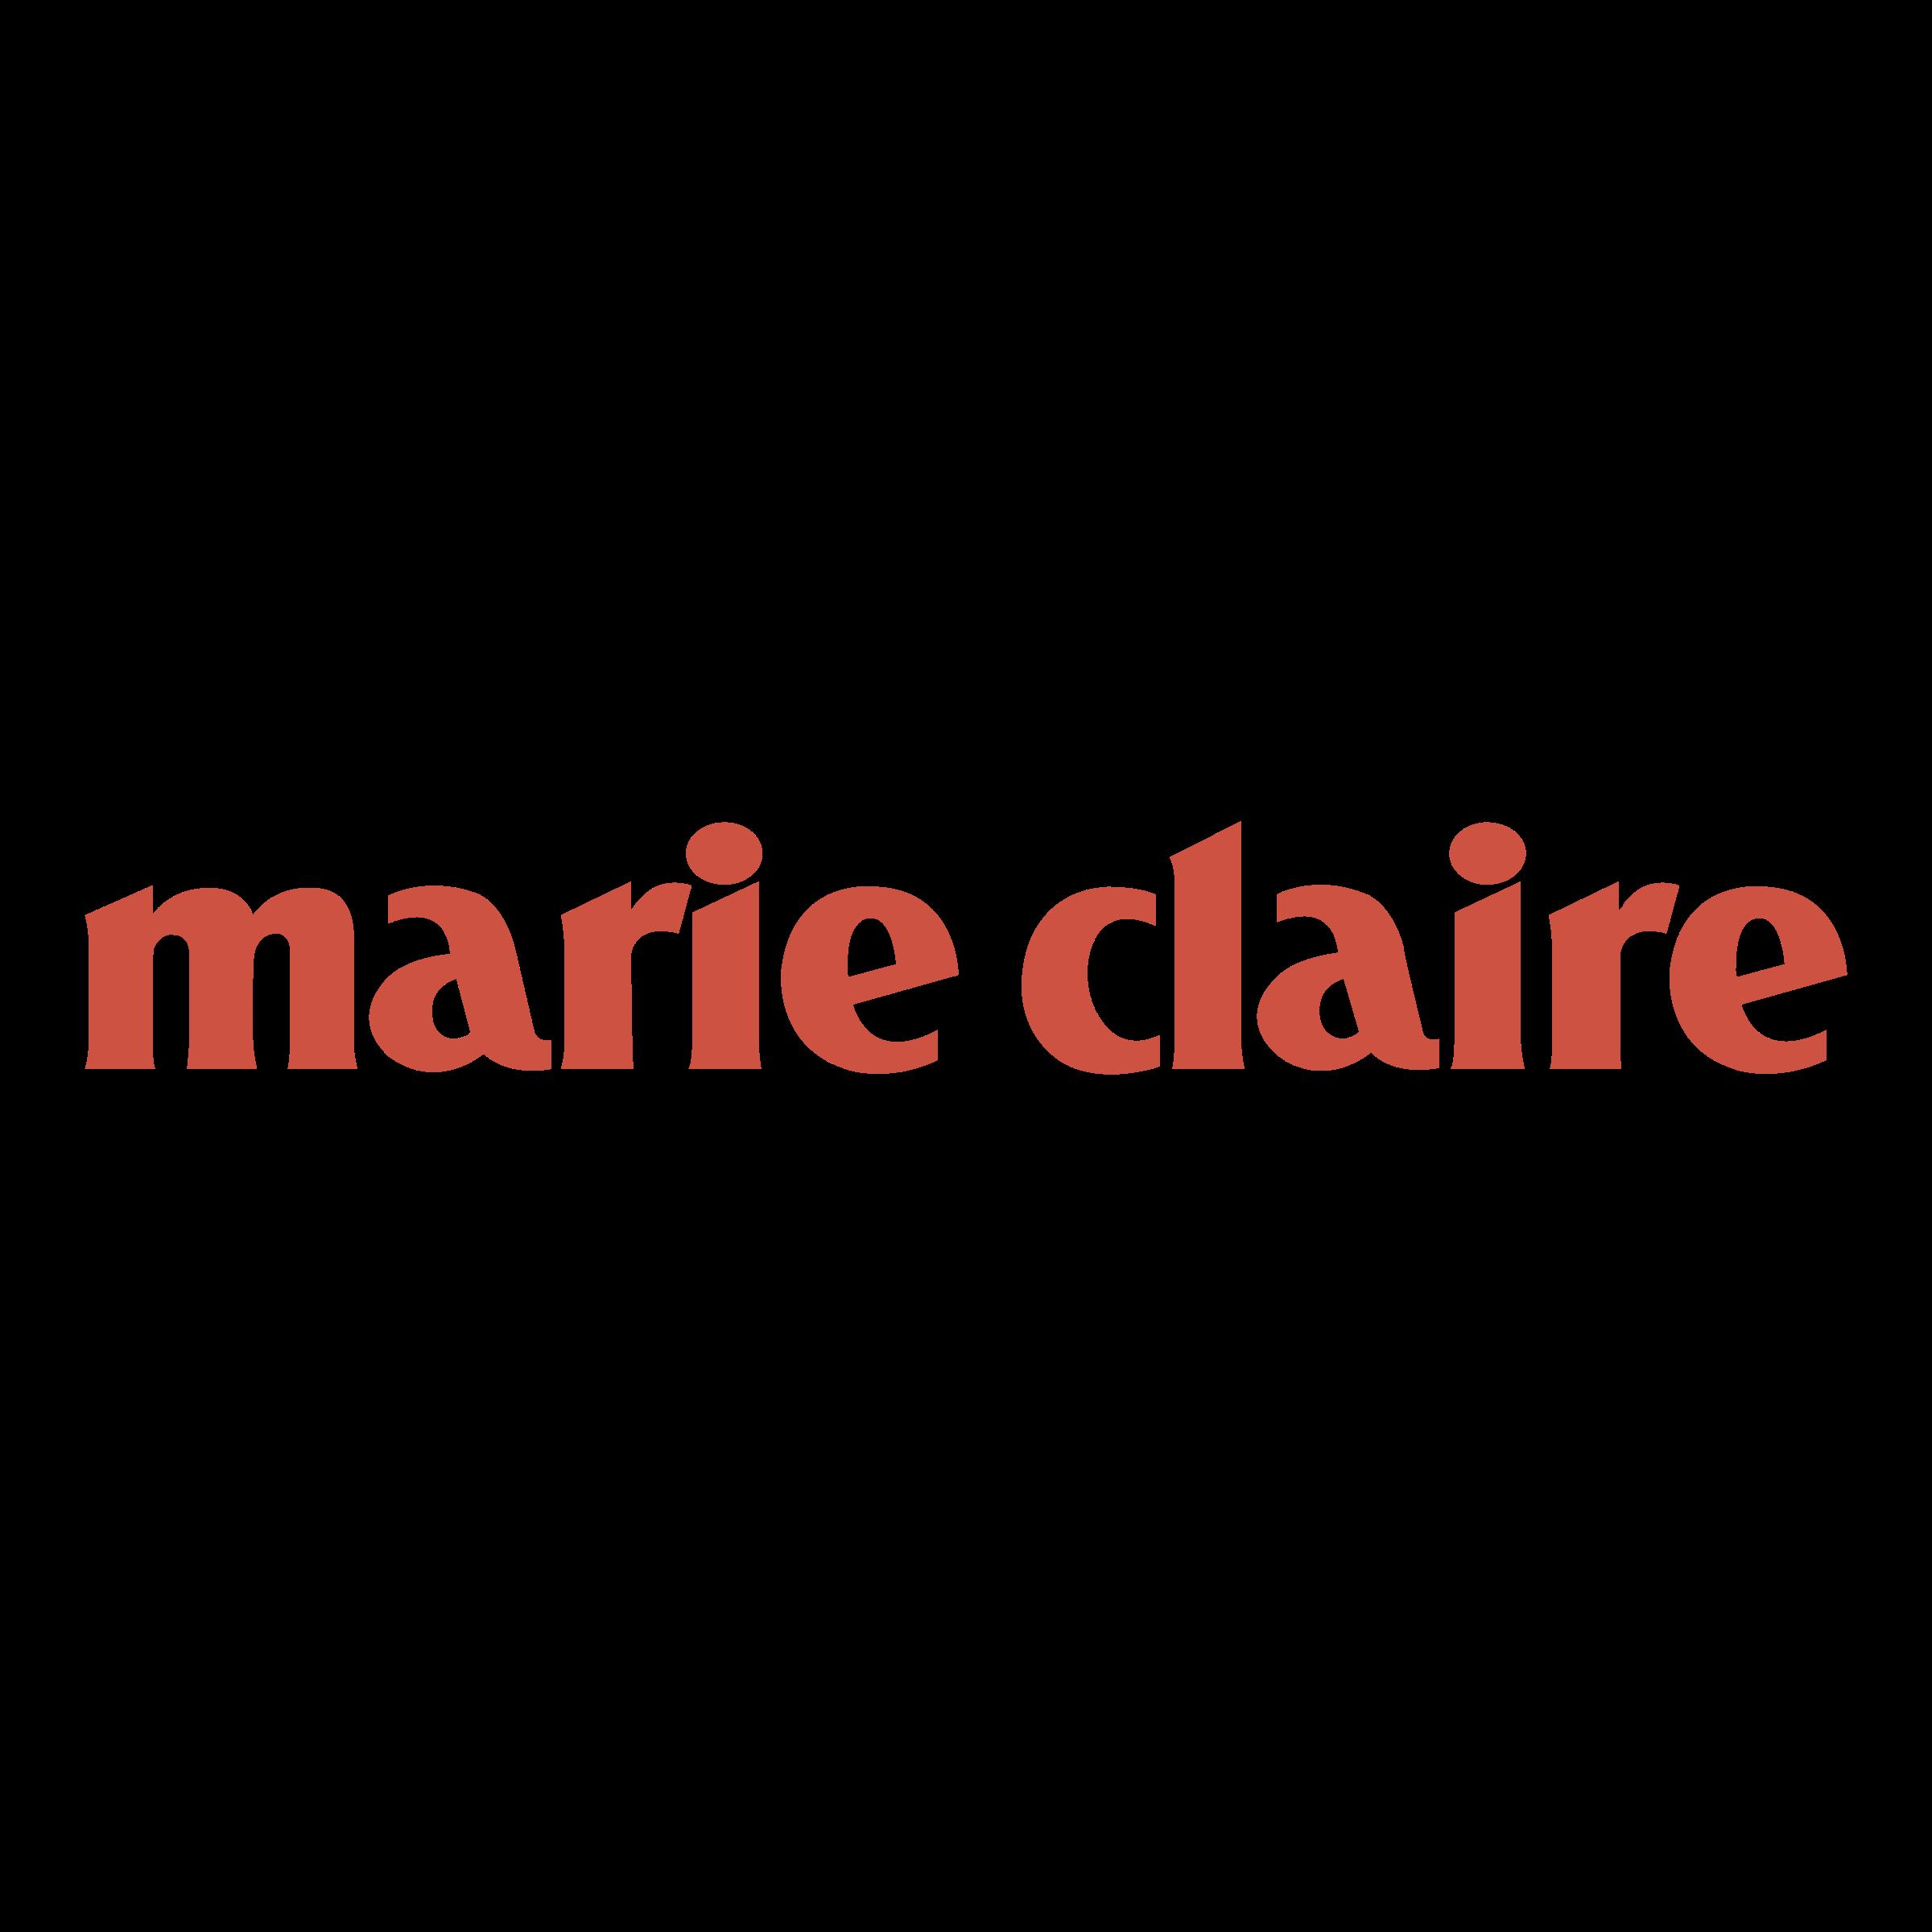 marie-claire-logo-png-transparent.png